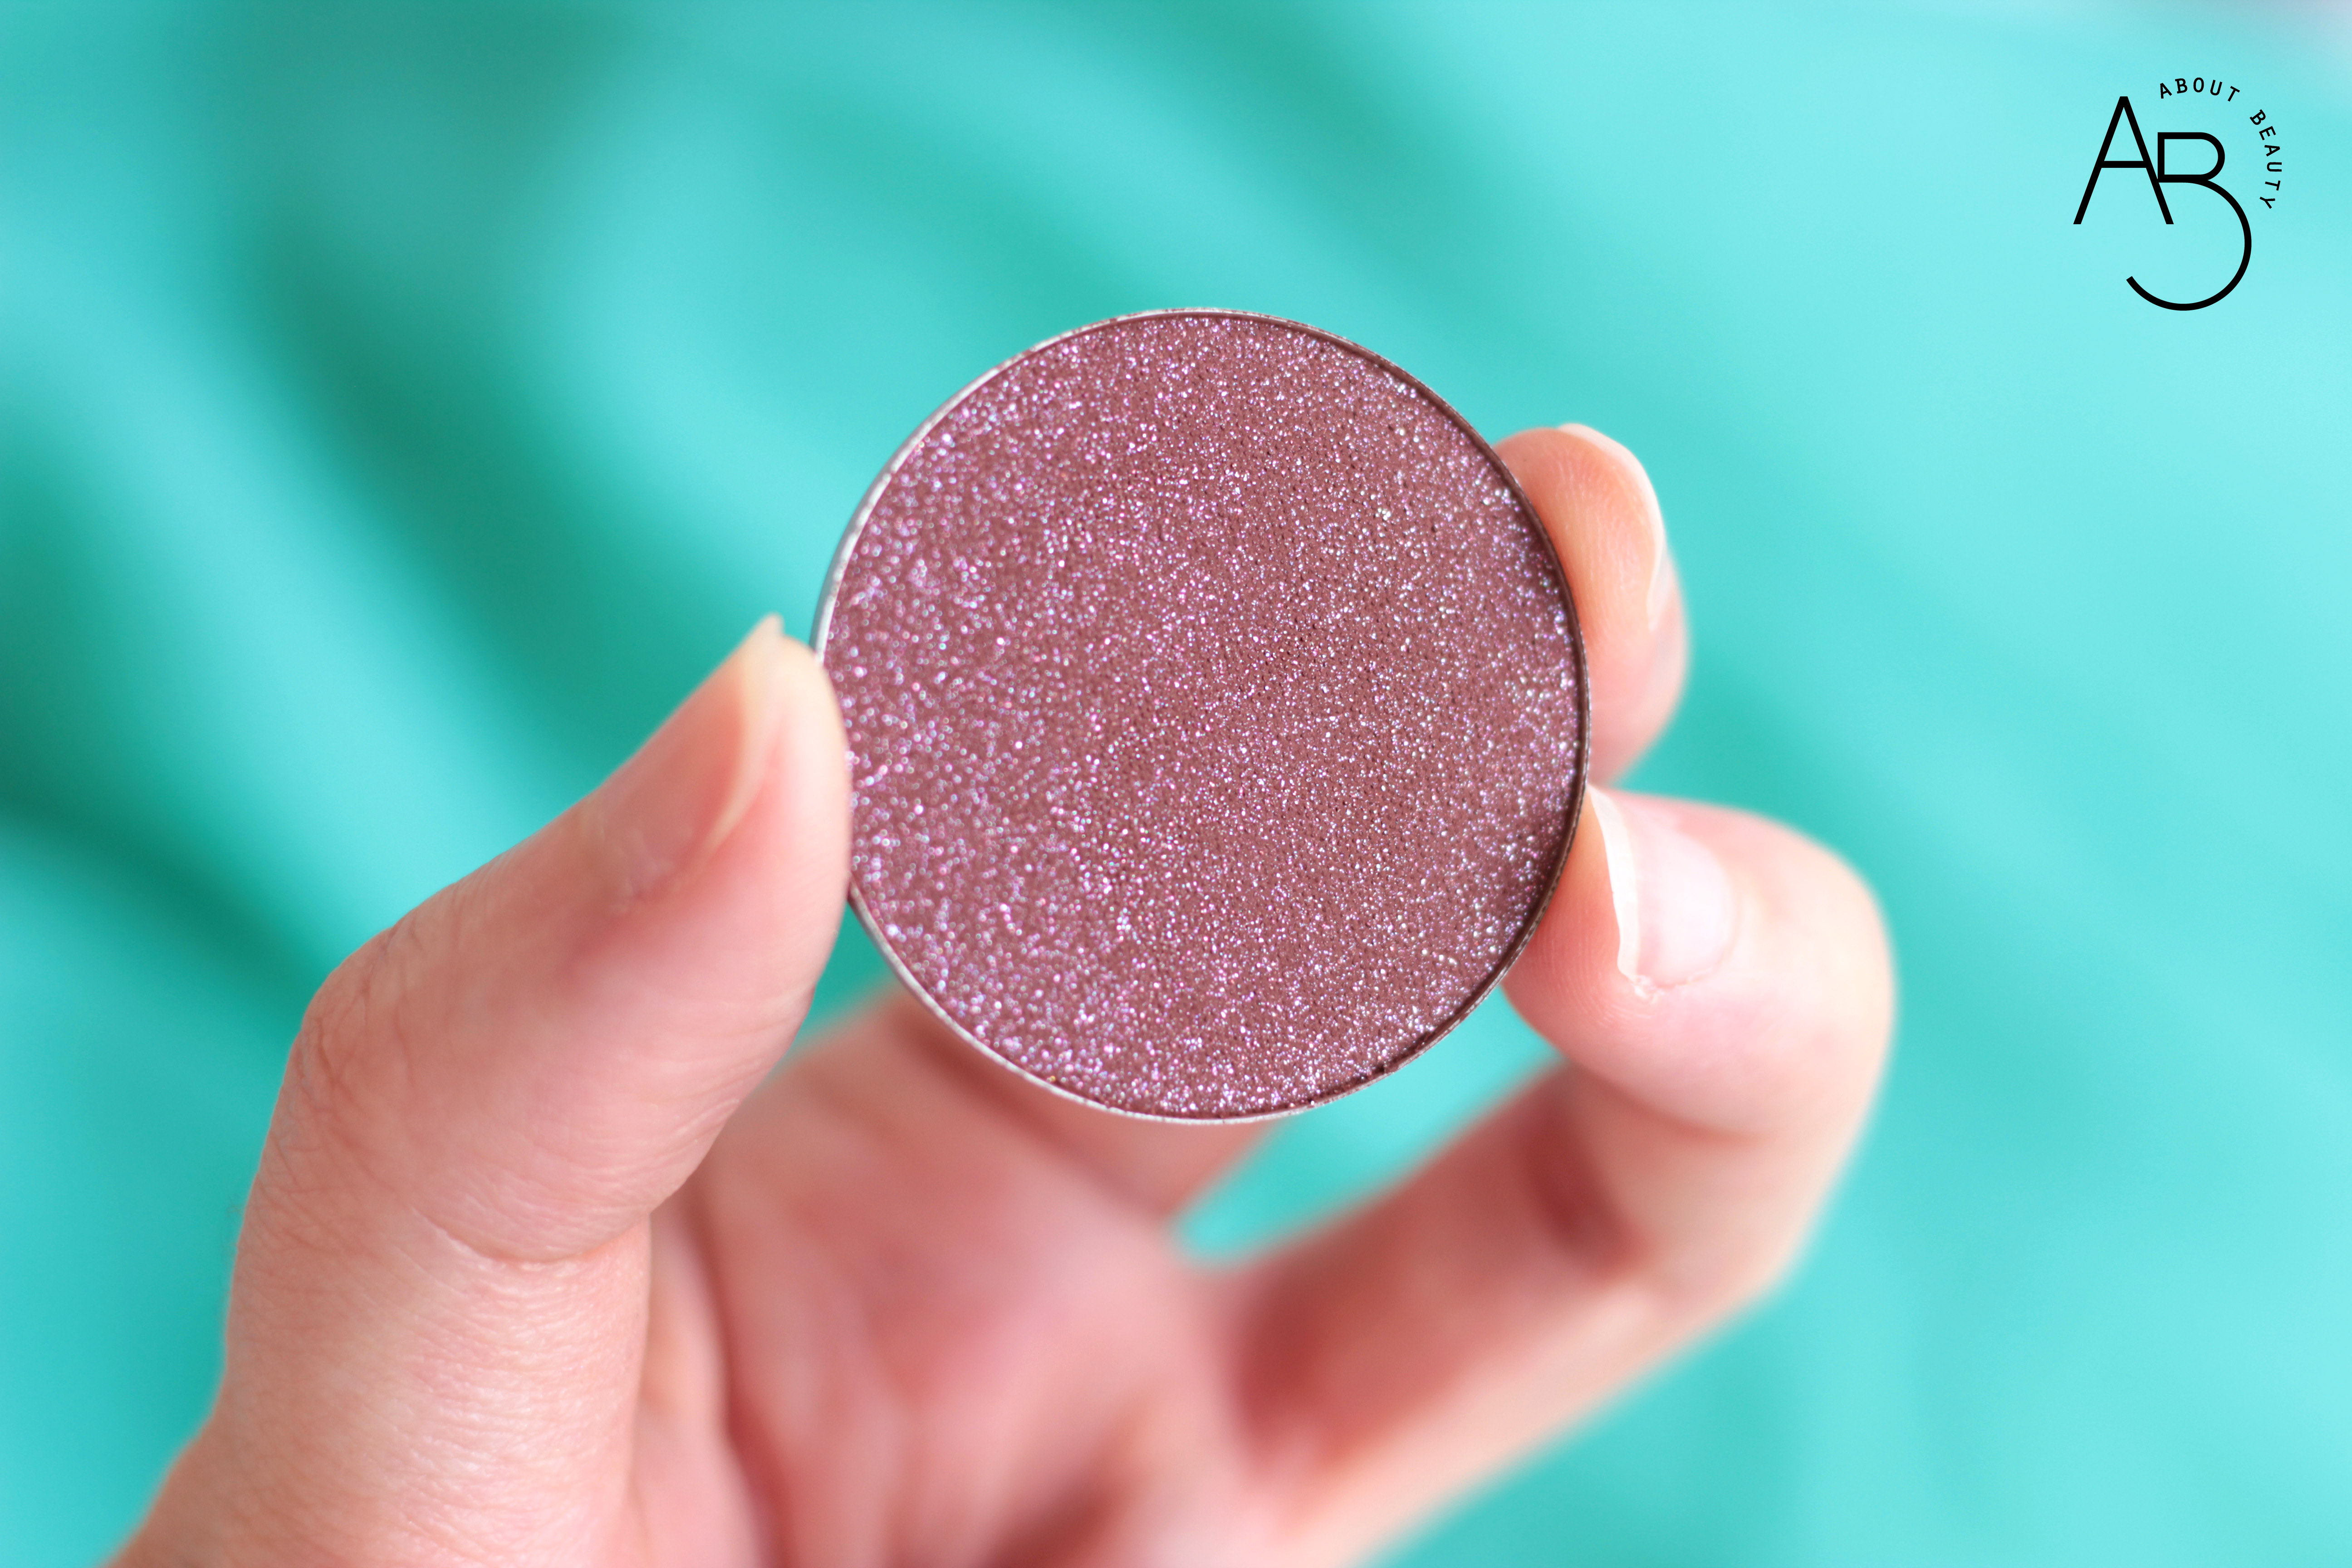 Neve Cosmetics Sparkling '67 - Info review recensione prezzo sconto swatch - Haight Ashbury